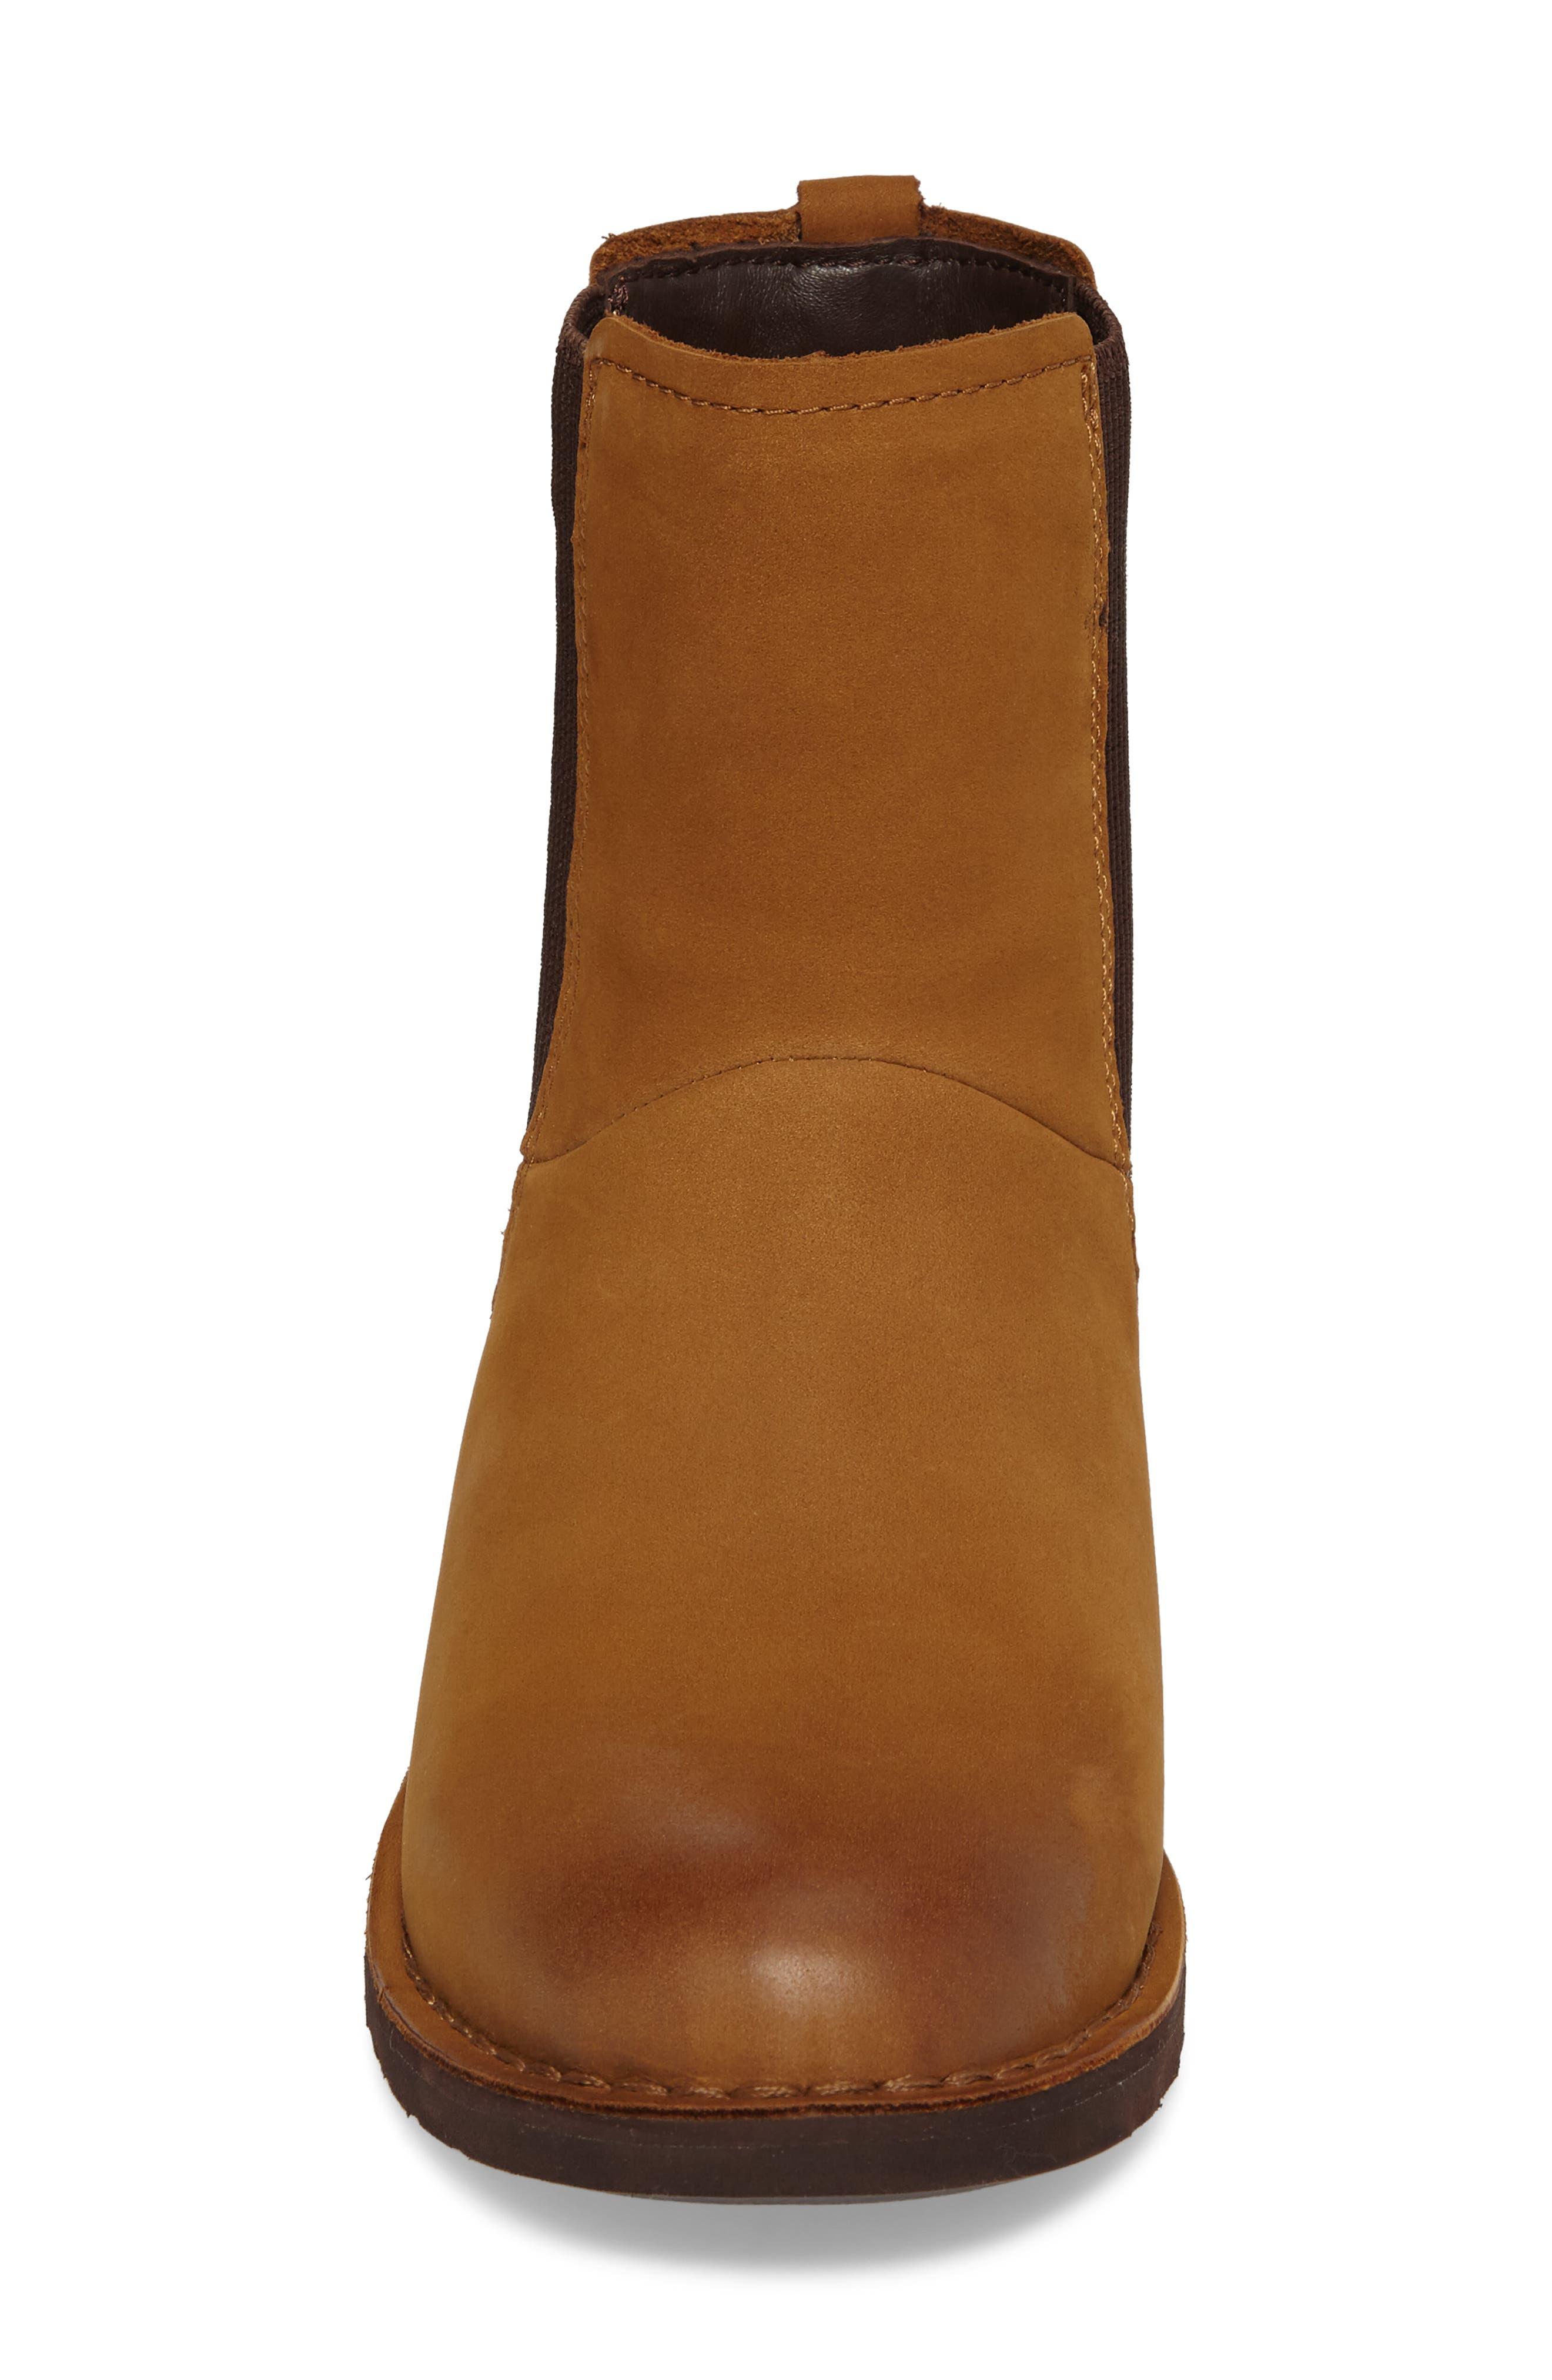 Larra Boot,                             Alternate thumbnail 4, color,                             Chestnut Nubuck Leather